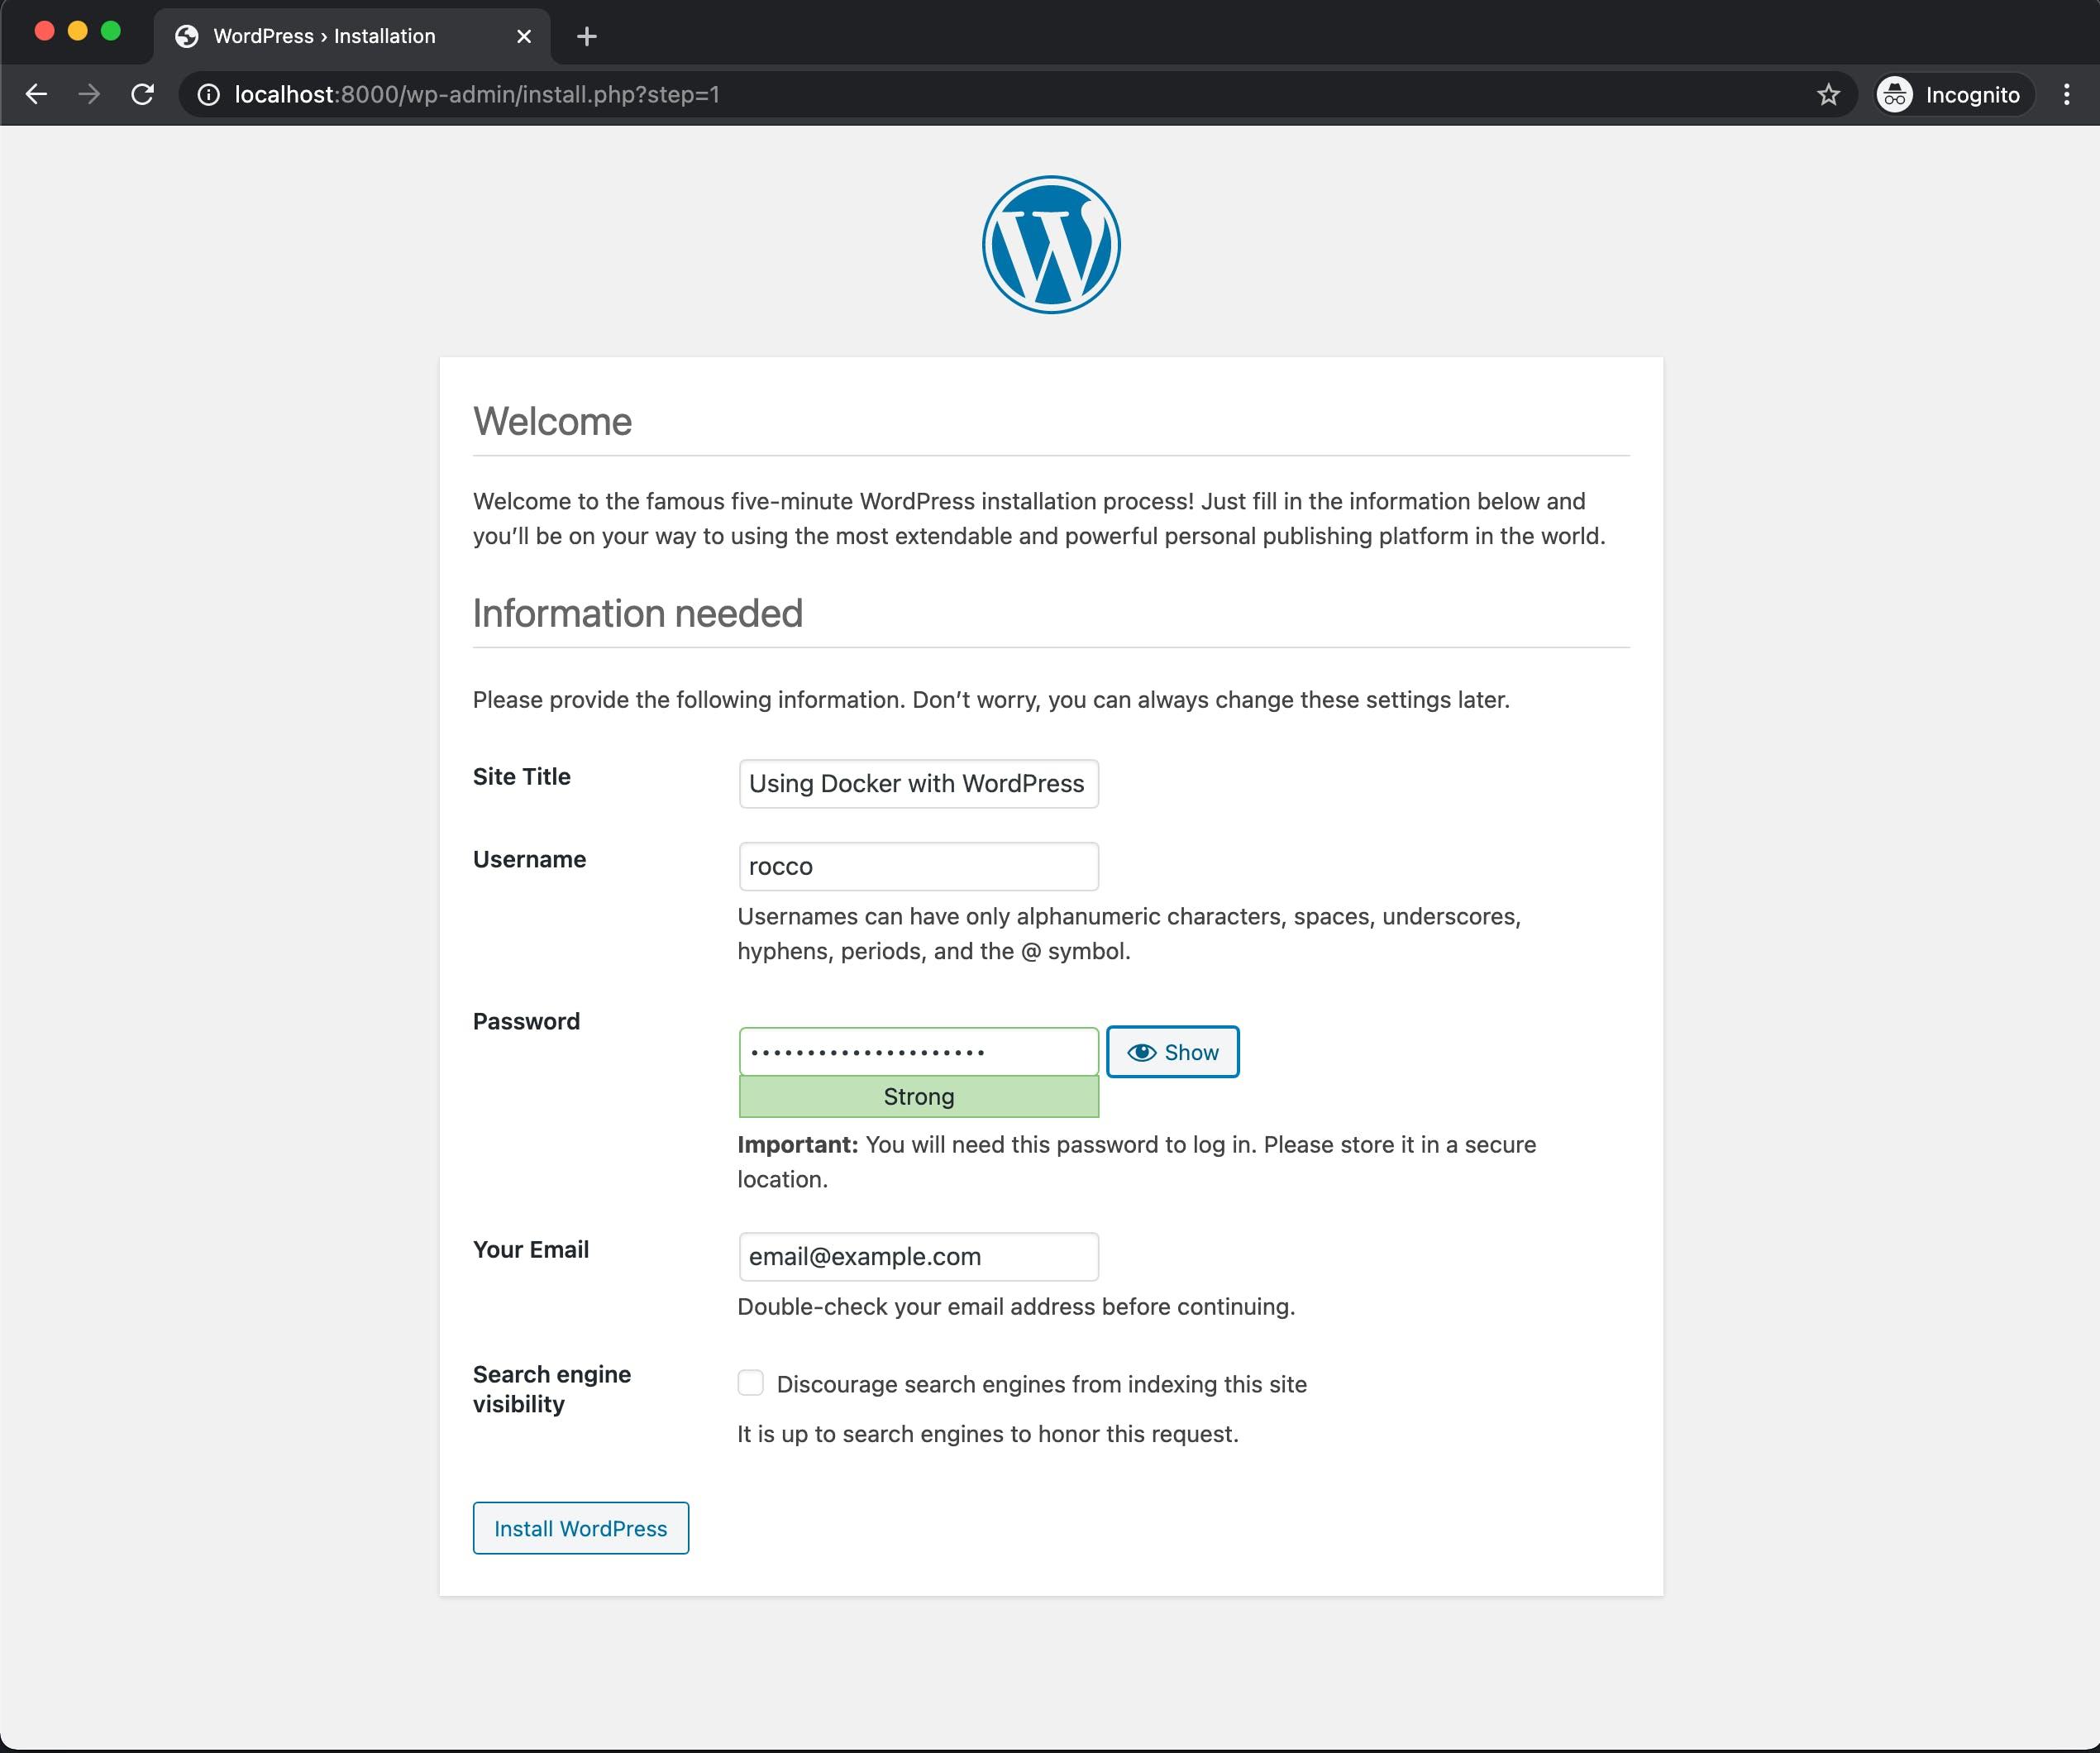 wordpress-step3.png